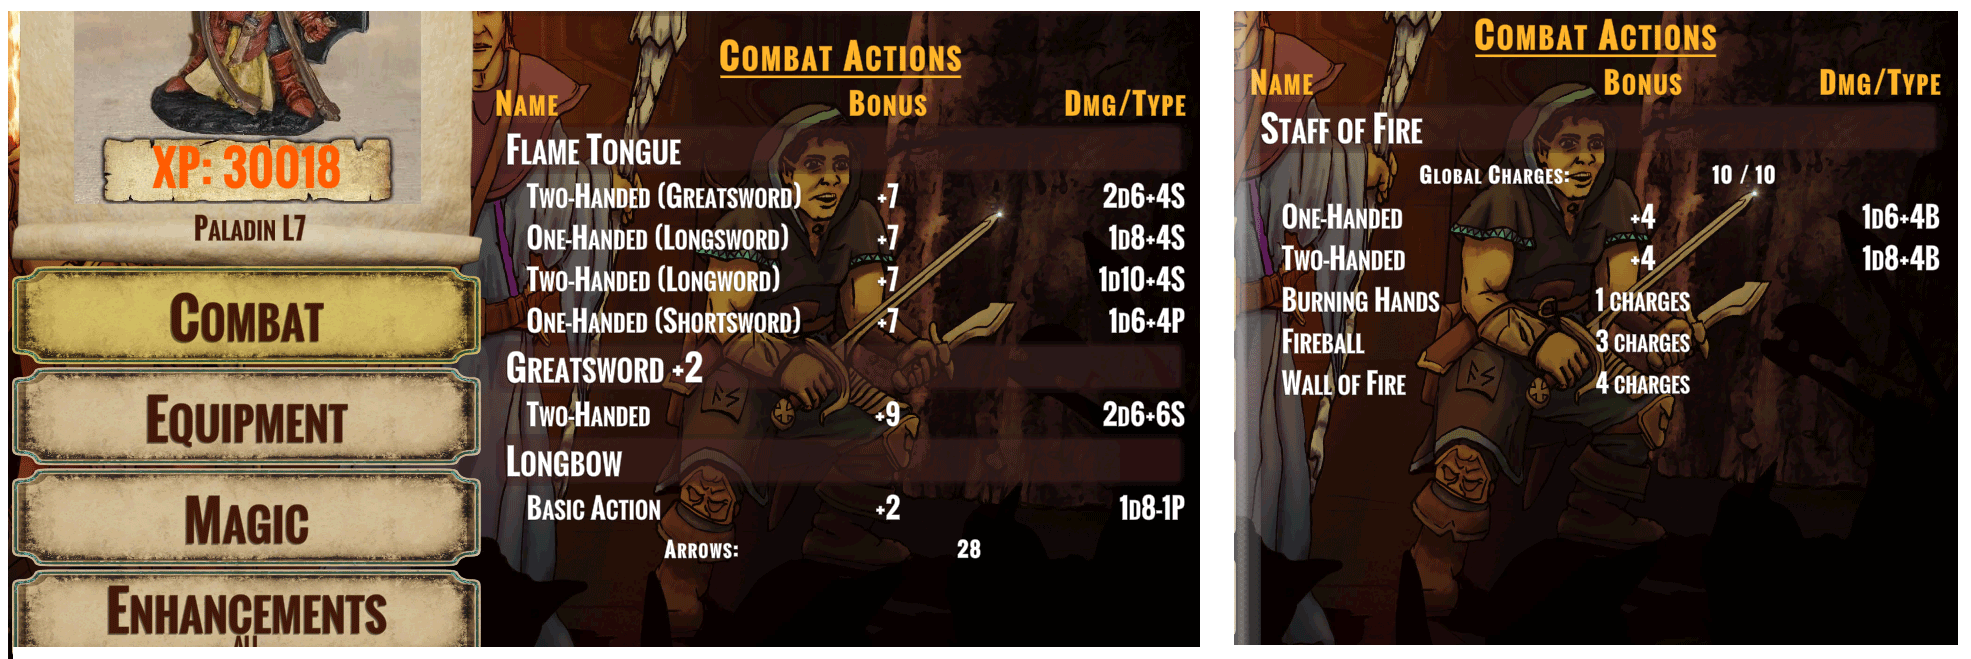 Combat Actions